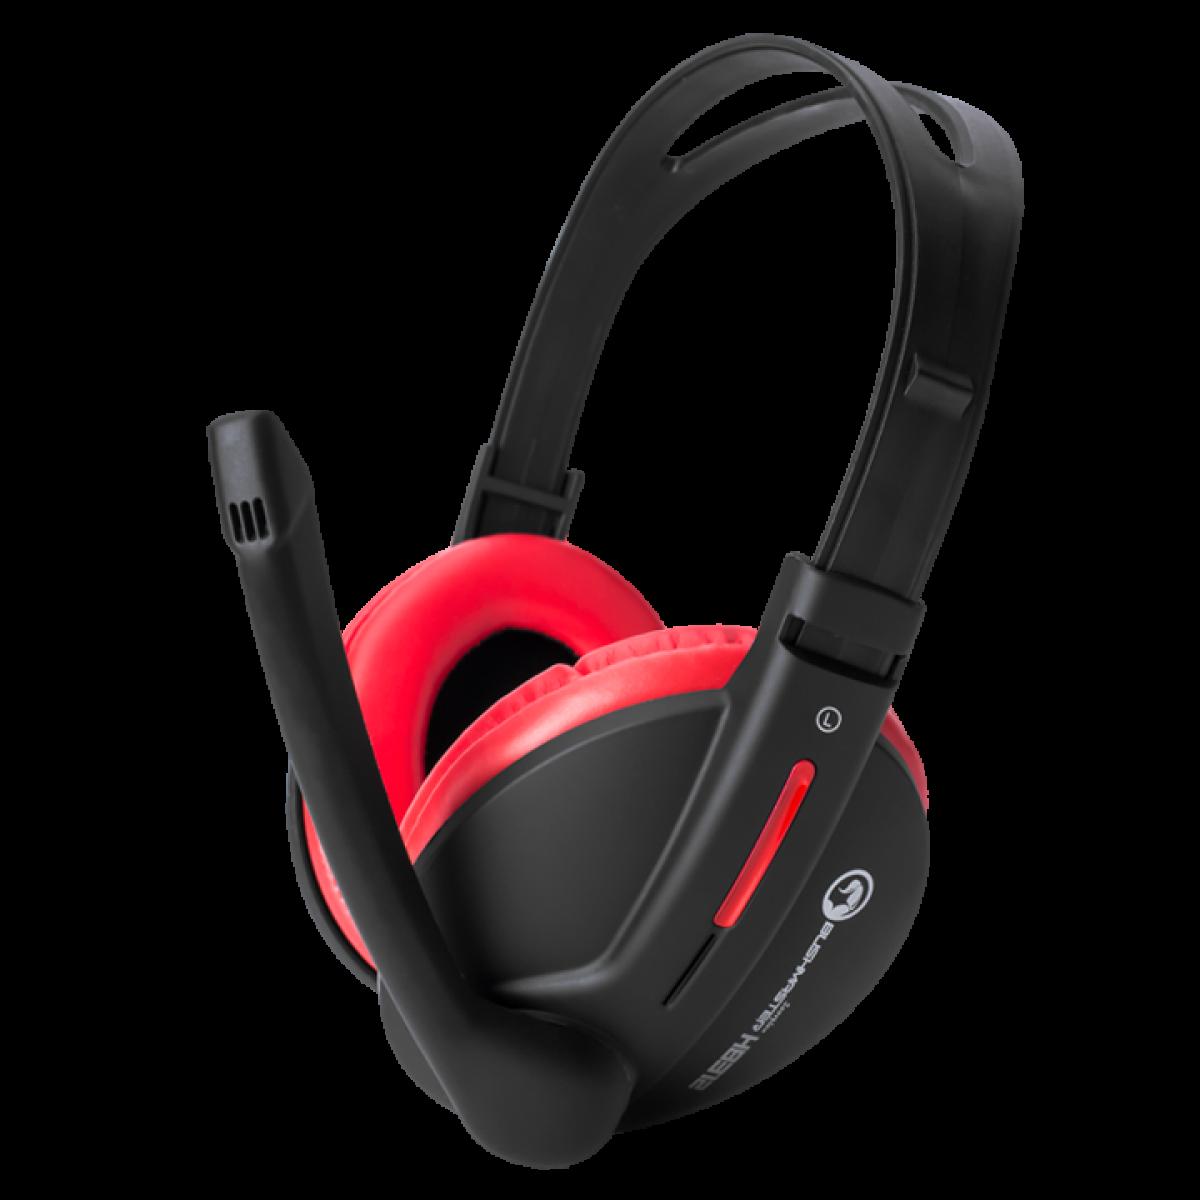 Headset Gamer Marvo Scorpion H8312 Preto/Vermelho